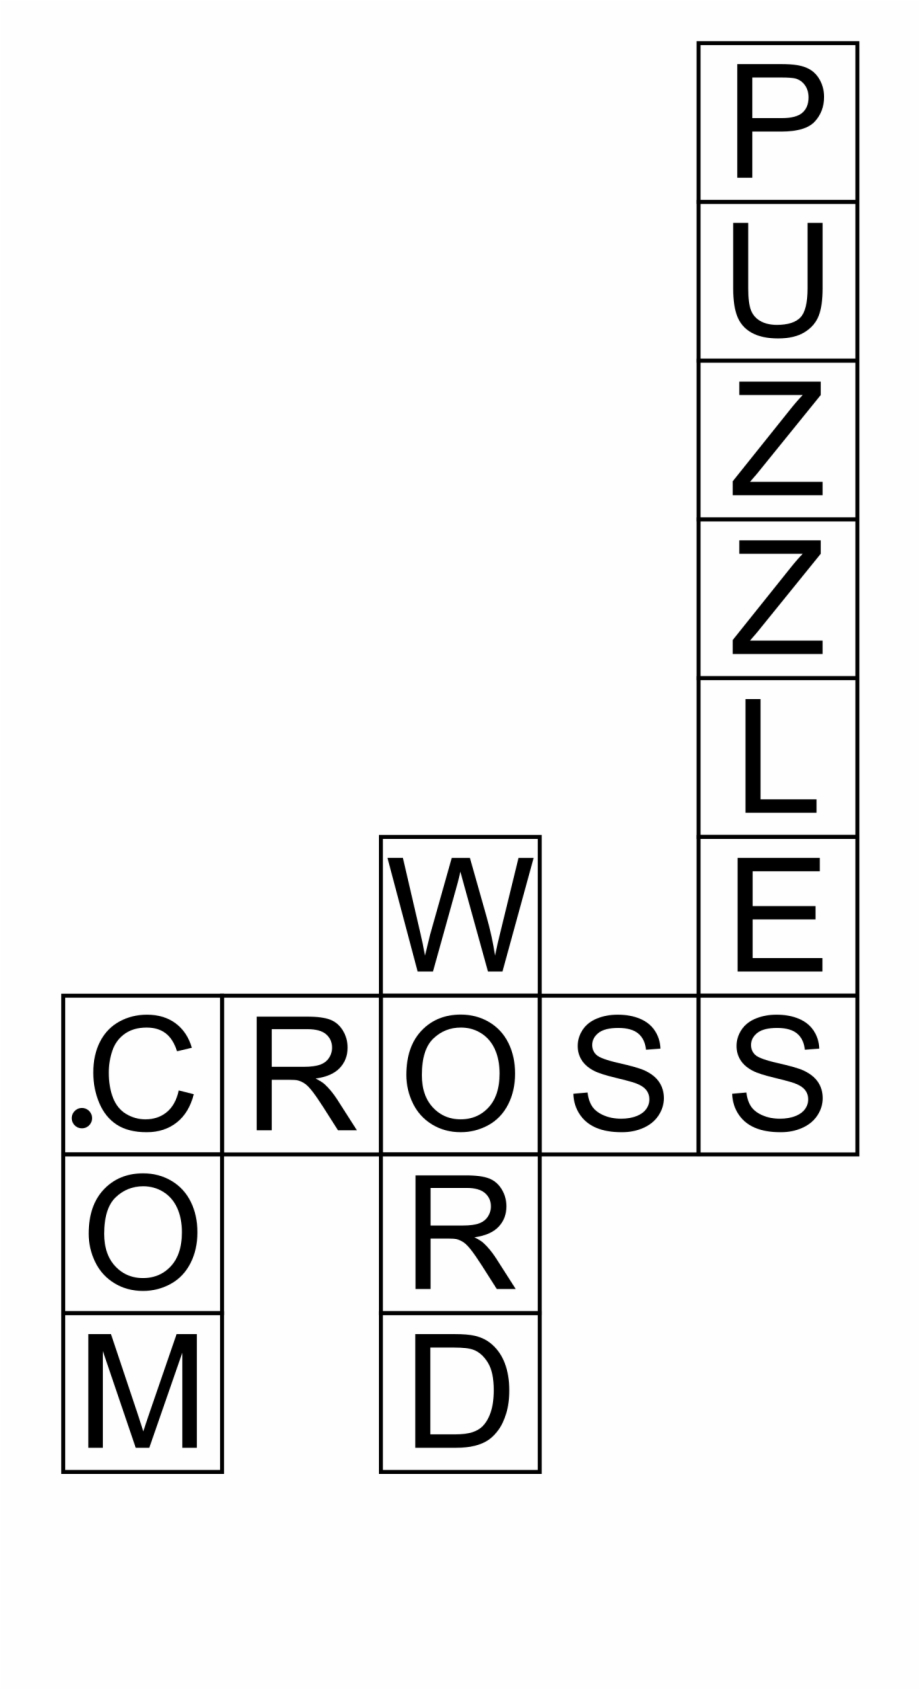 Puzzle Clipart Background.